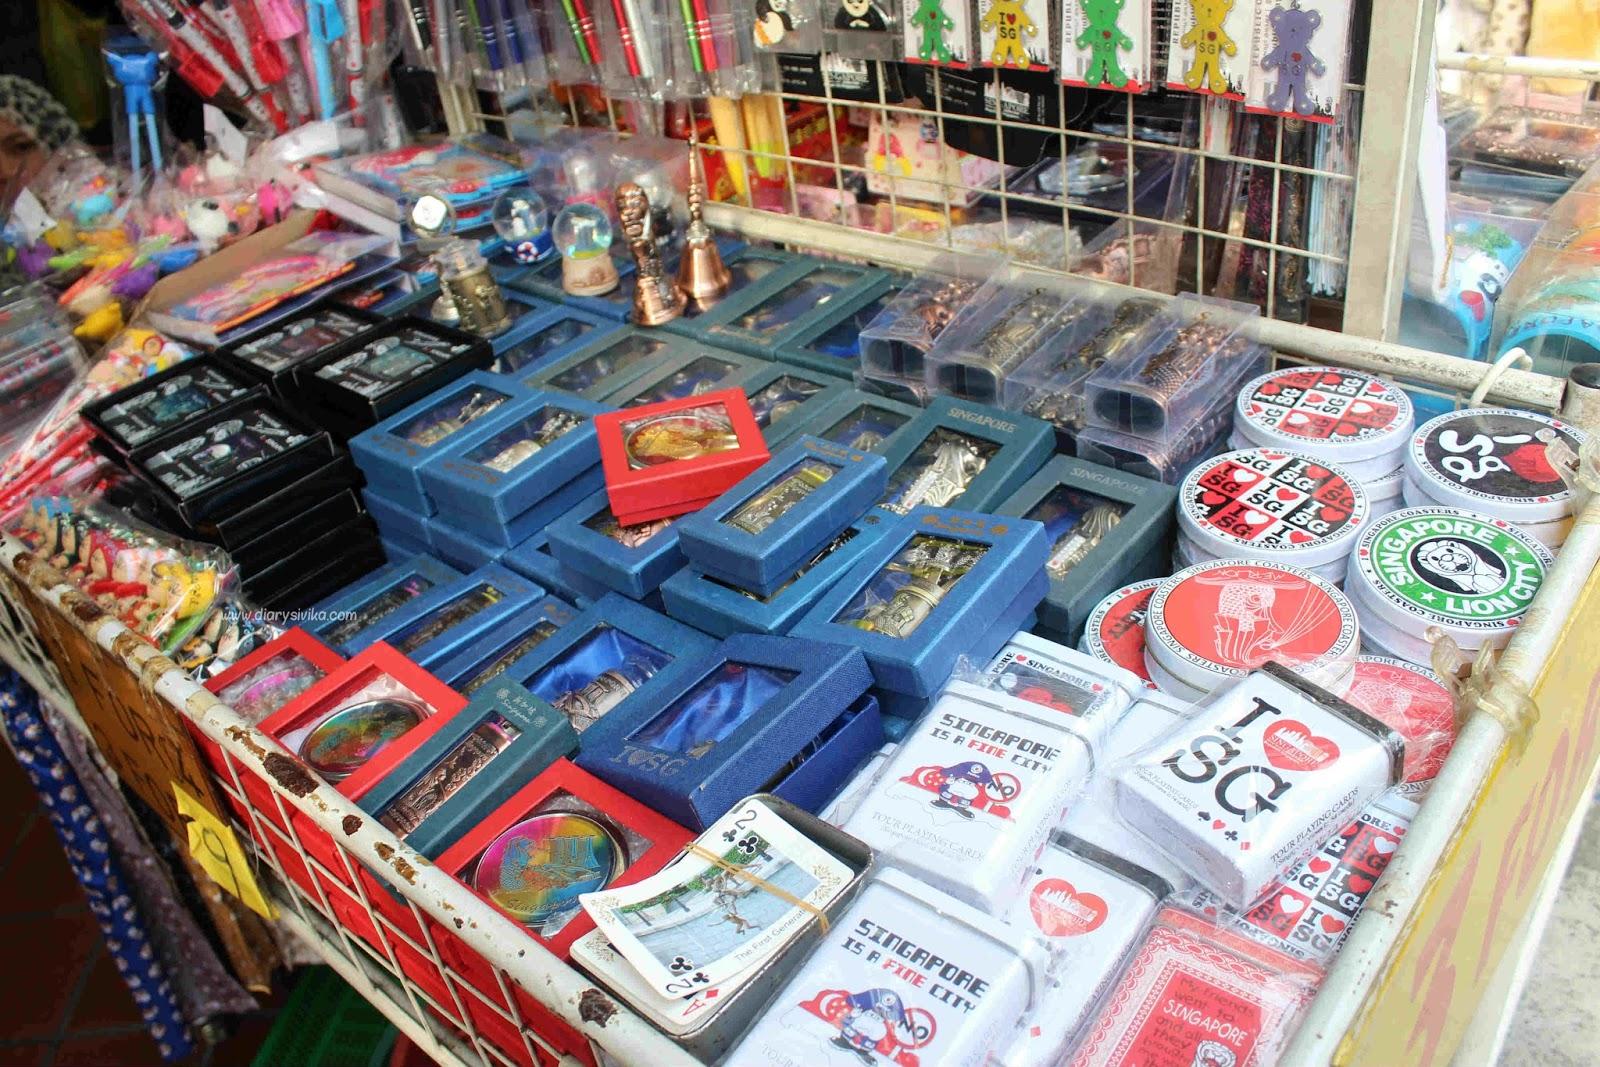 Harga Yang Ditawarkan Pun Menurut Saya Lebih Murah Daripada Kawasan Belanja Lainnya Di Singapore